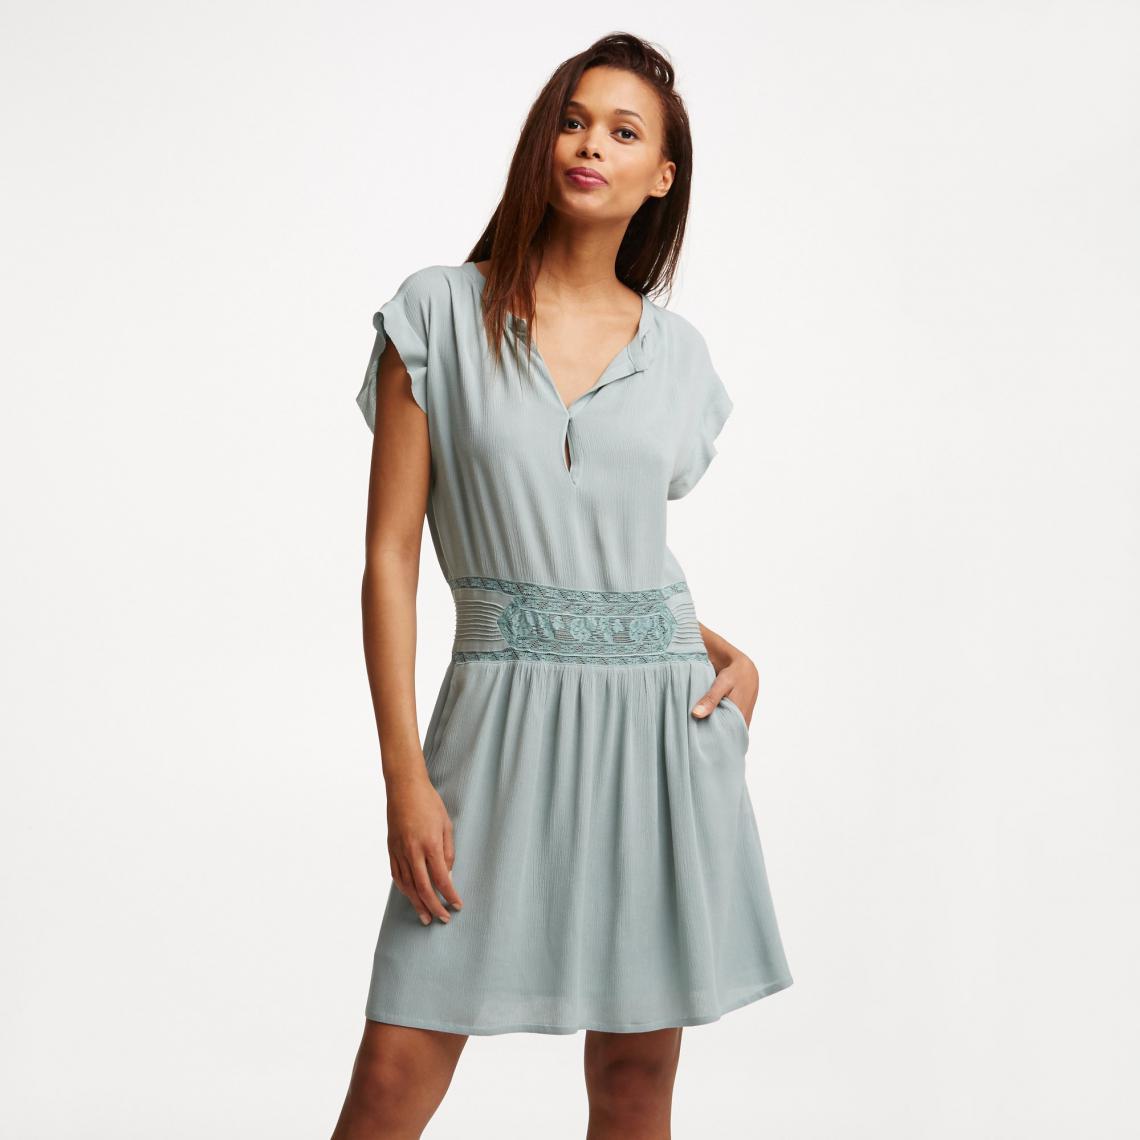 4912d83e29a Robe courte fluide taille dentelle femme See U soon - Vert See u Soon Femme